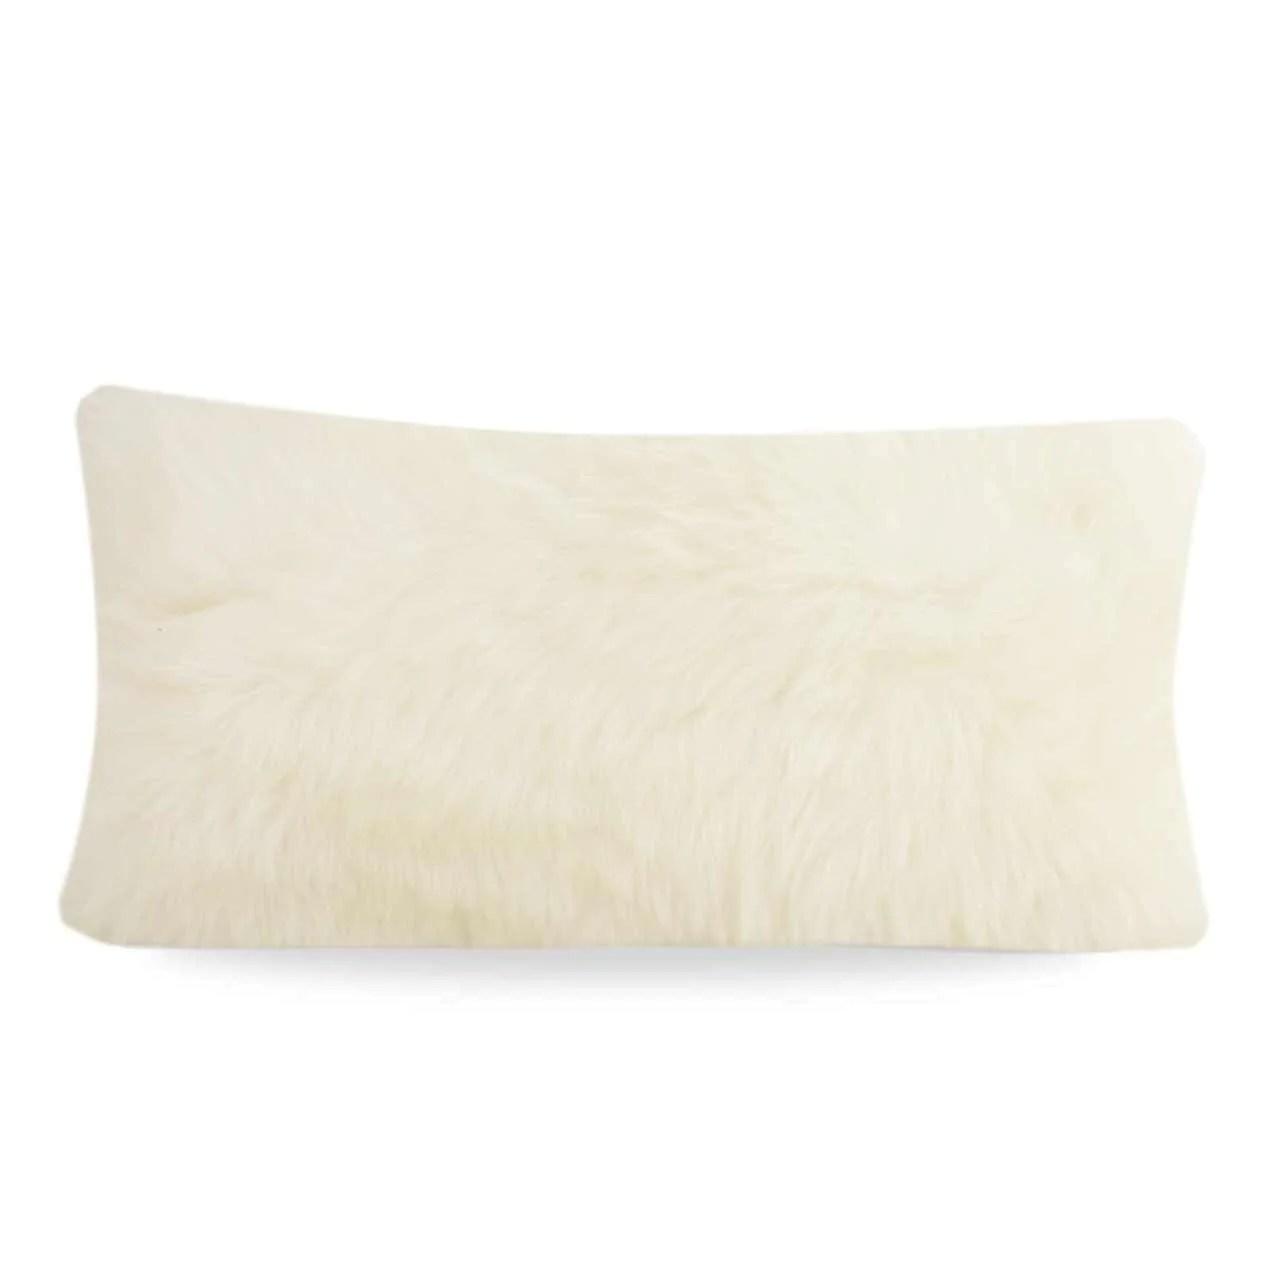 limited edition long wool sheepskin cushion small rectangle natural